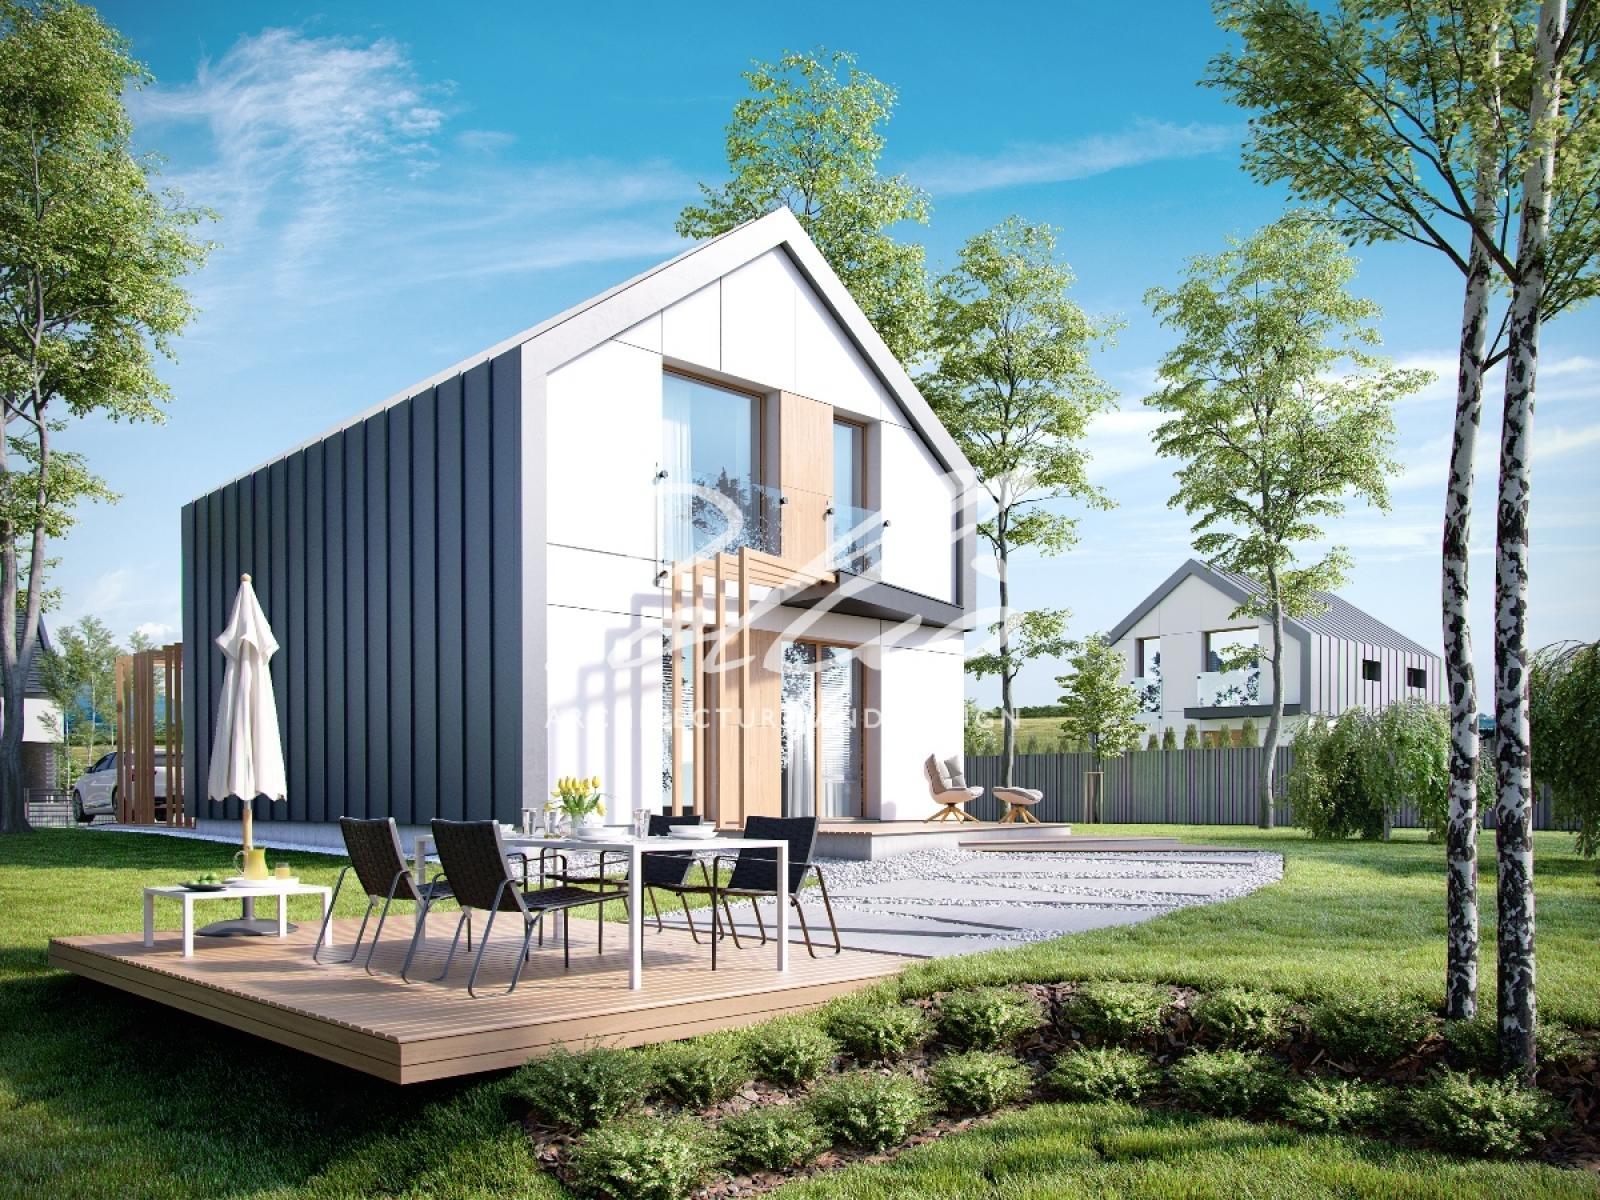 P1 Проект пассивного дома P1 фото 2